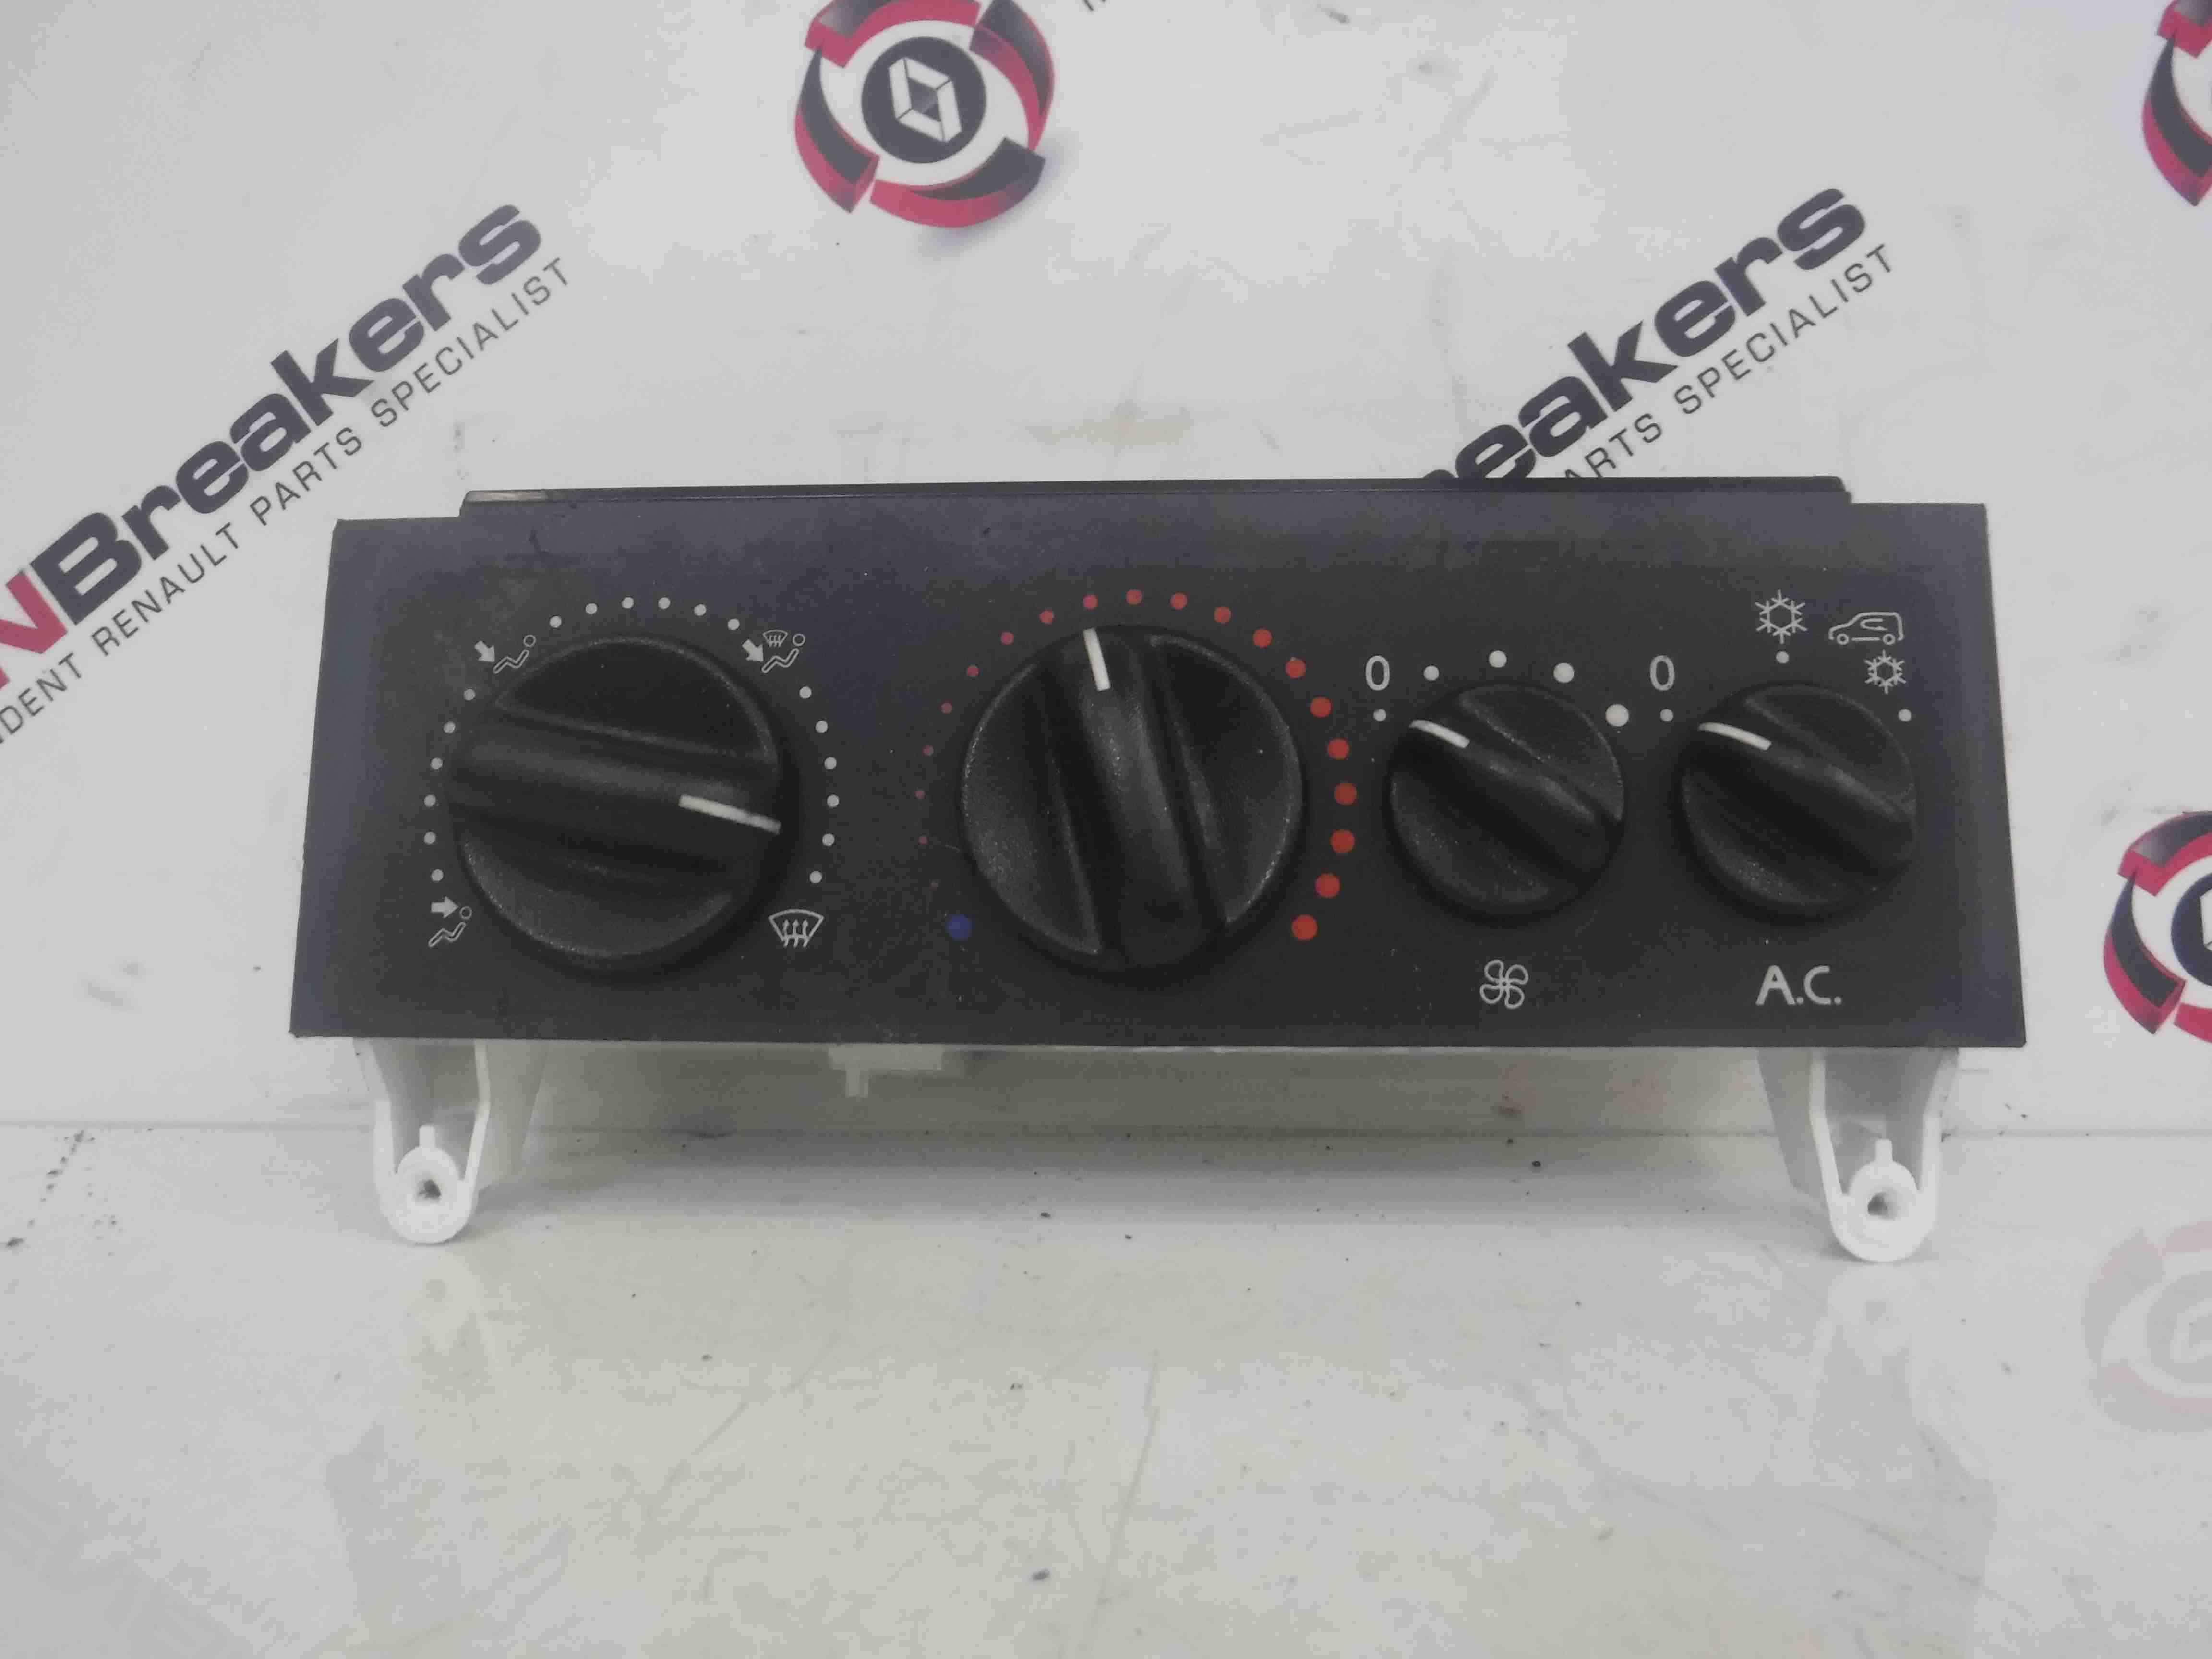 Renault Kangoo MPV 1993-2003 Heater Controls Panel Switches Aircon 11111